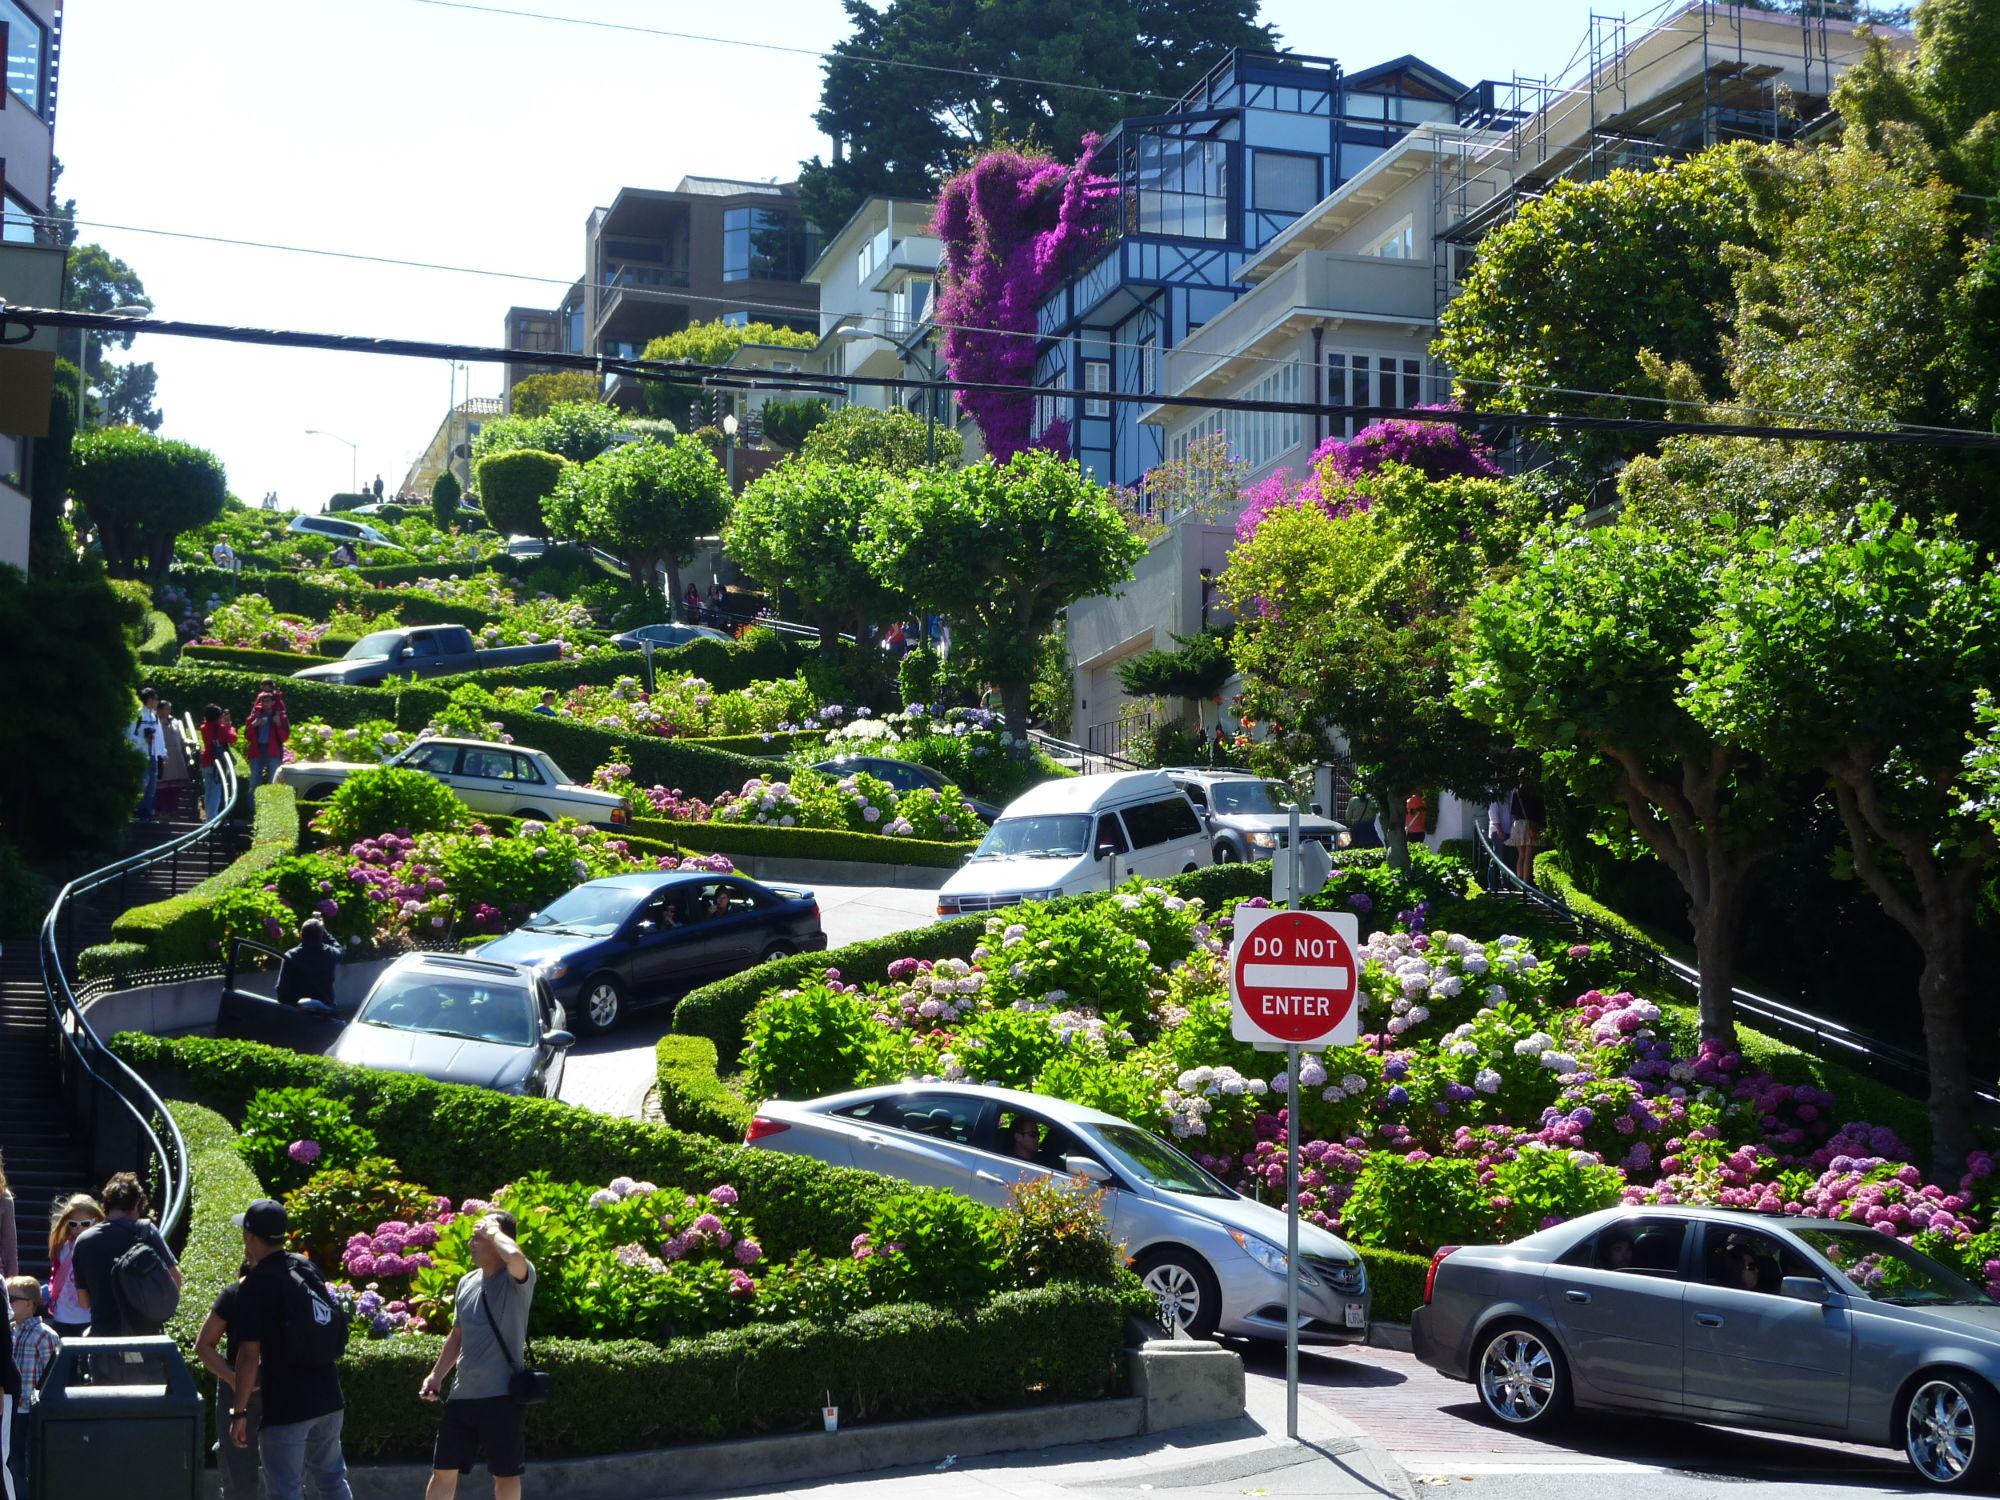 لومبارد سان فرانسيسكو